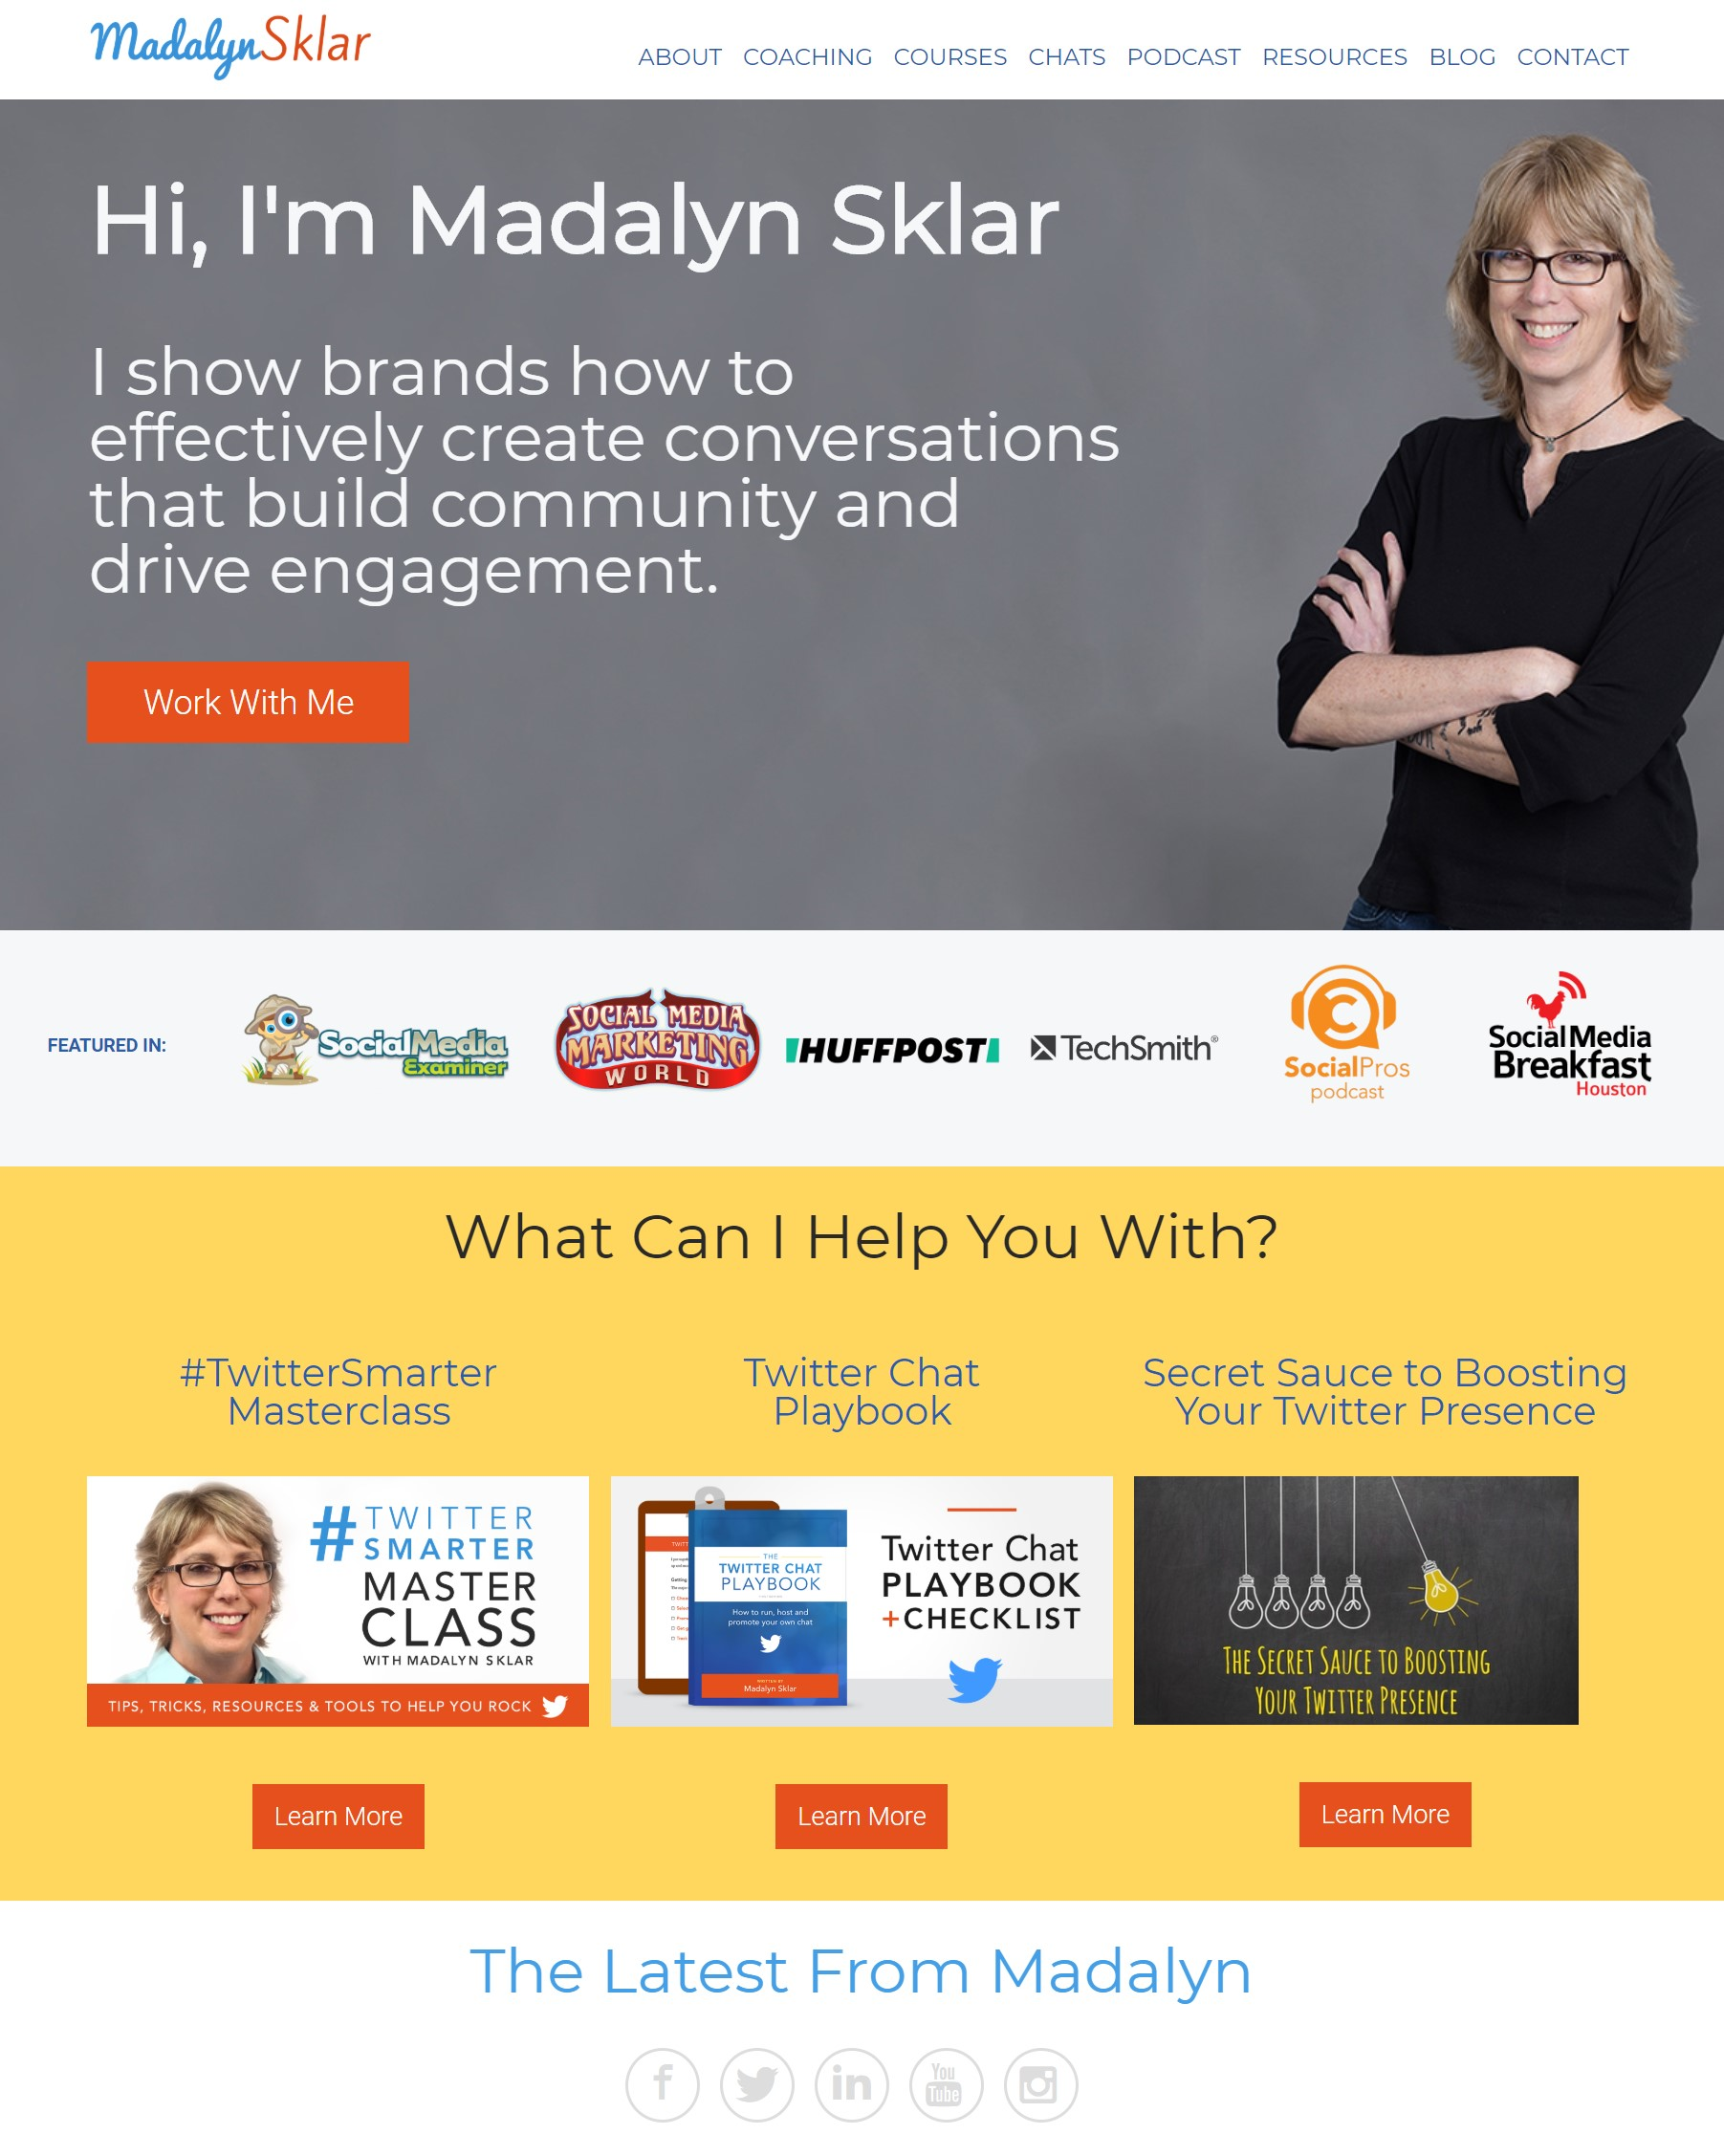 Screenshot of Madalyn Sklar's website